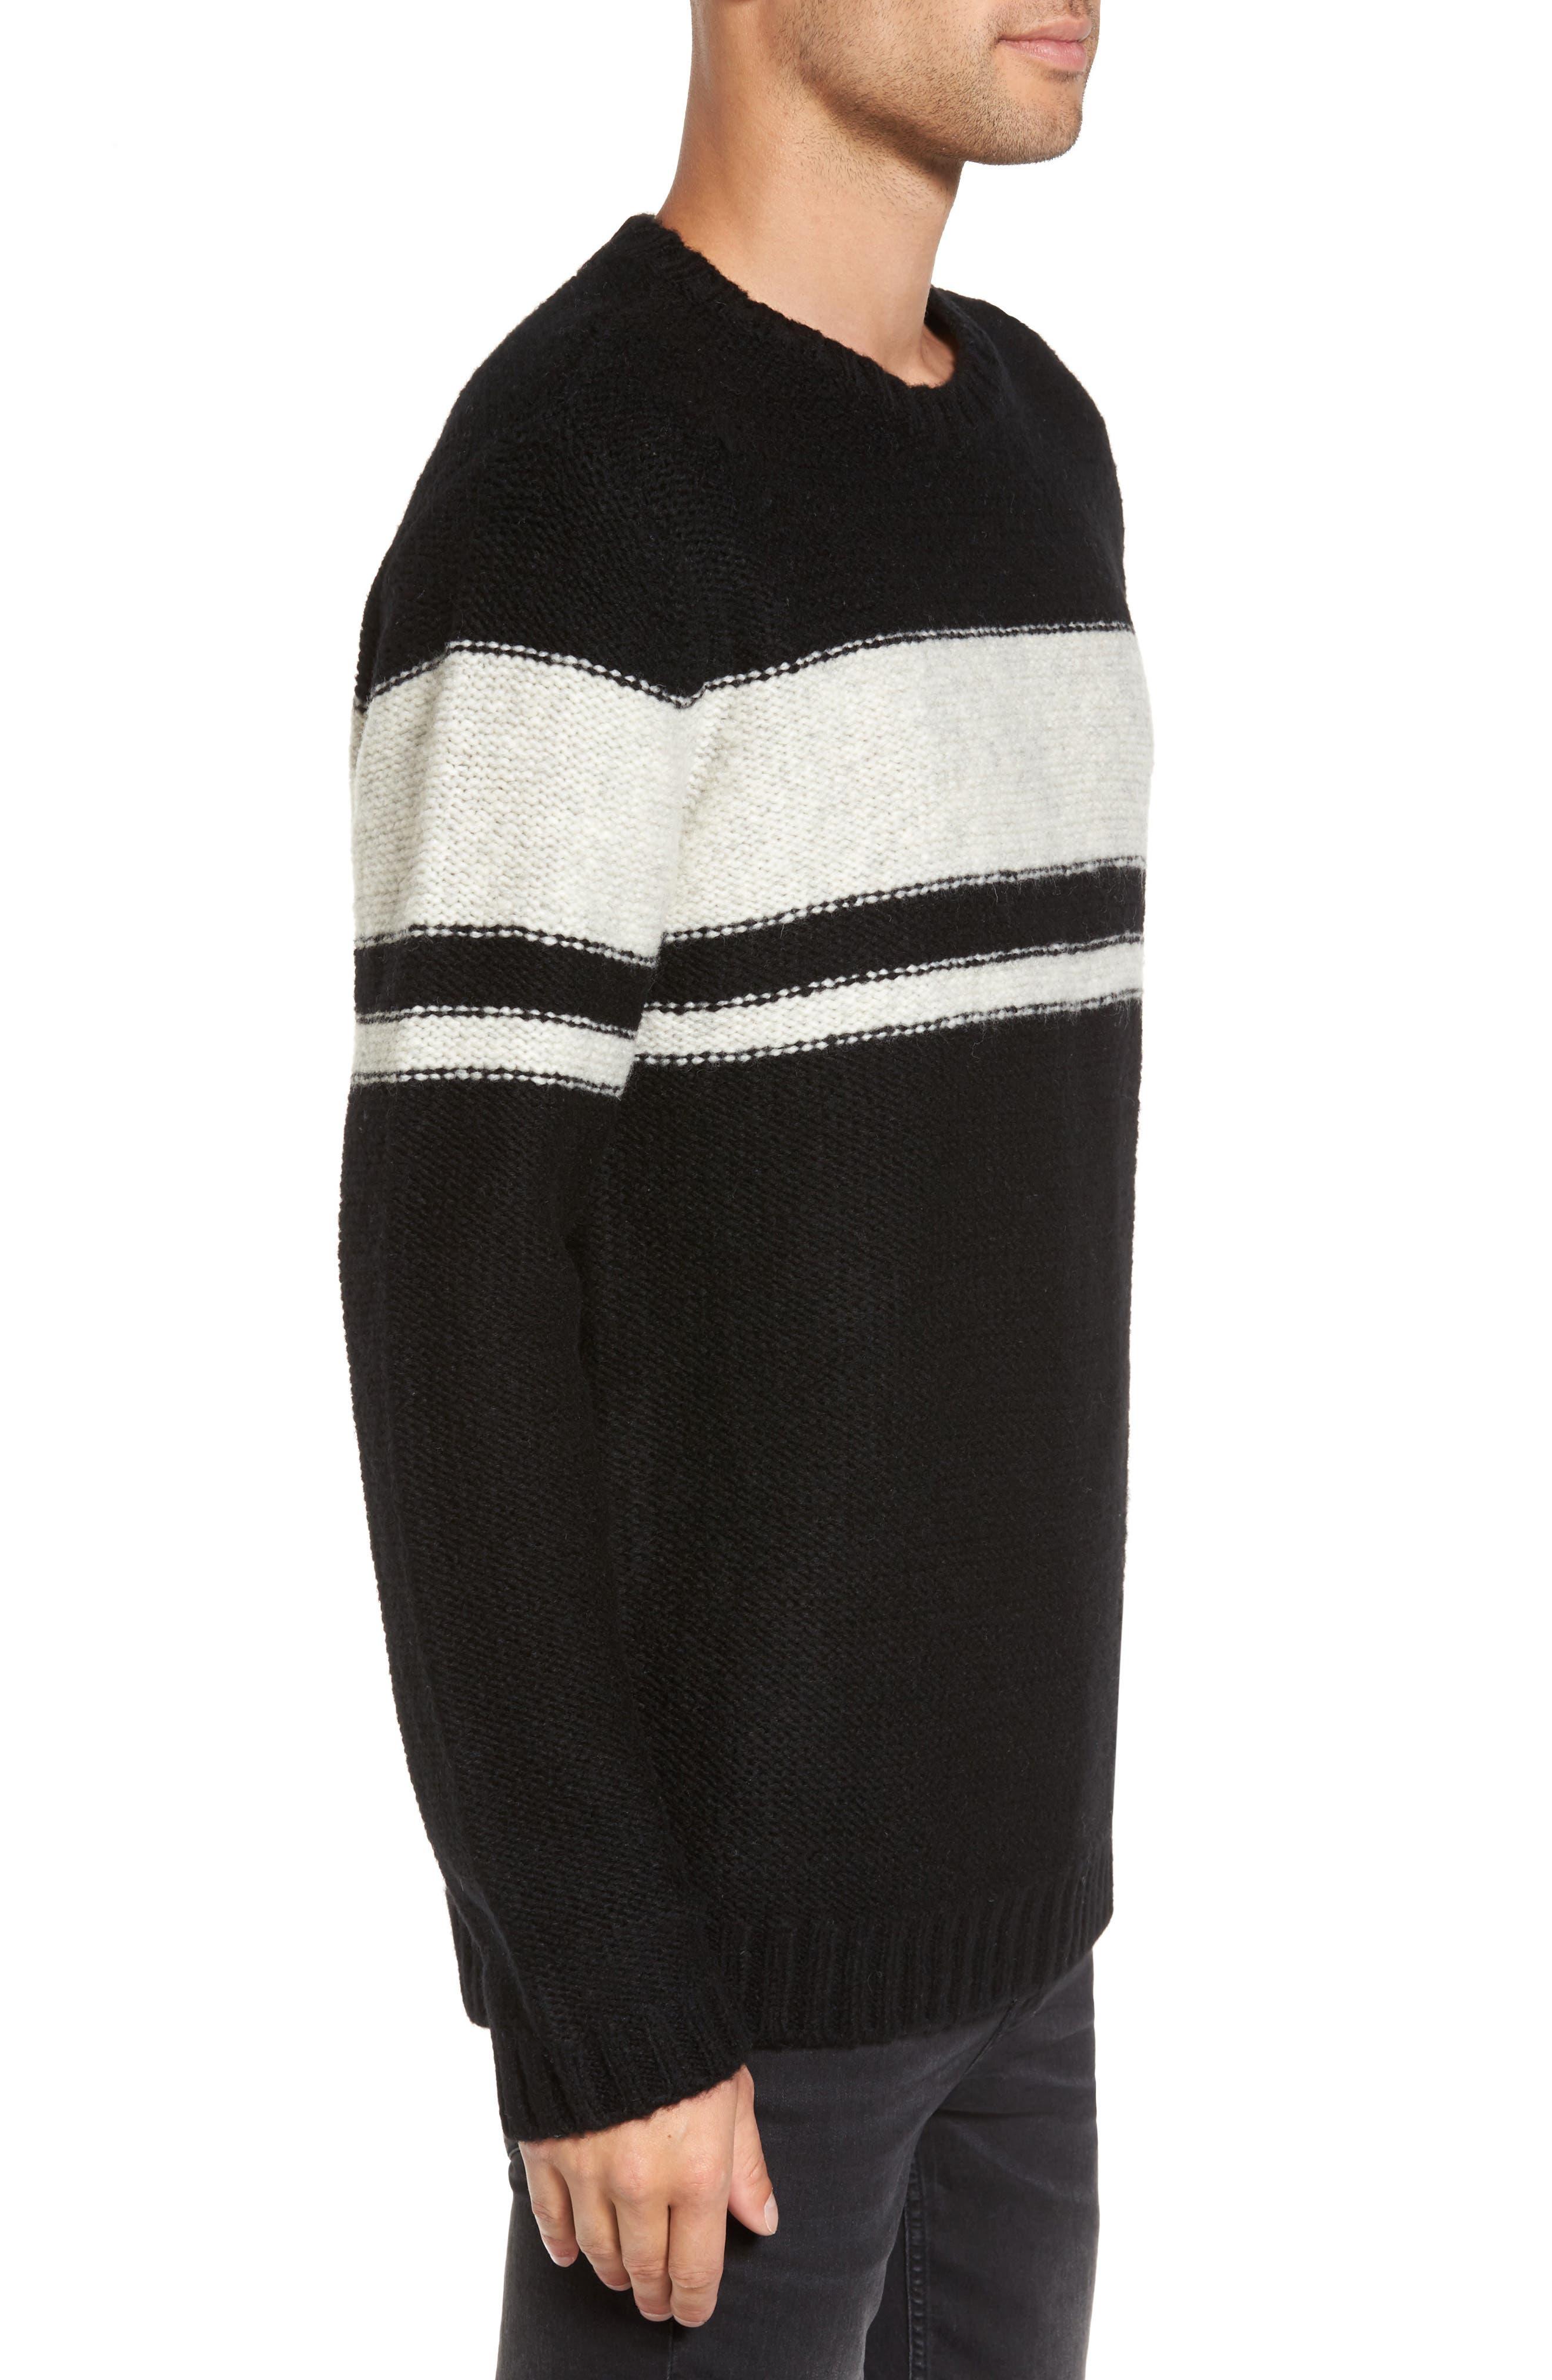 Blume Sweater,                             Alternate thumbnail 3, color,                             Black Boom